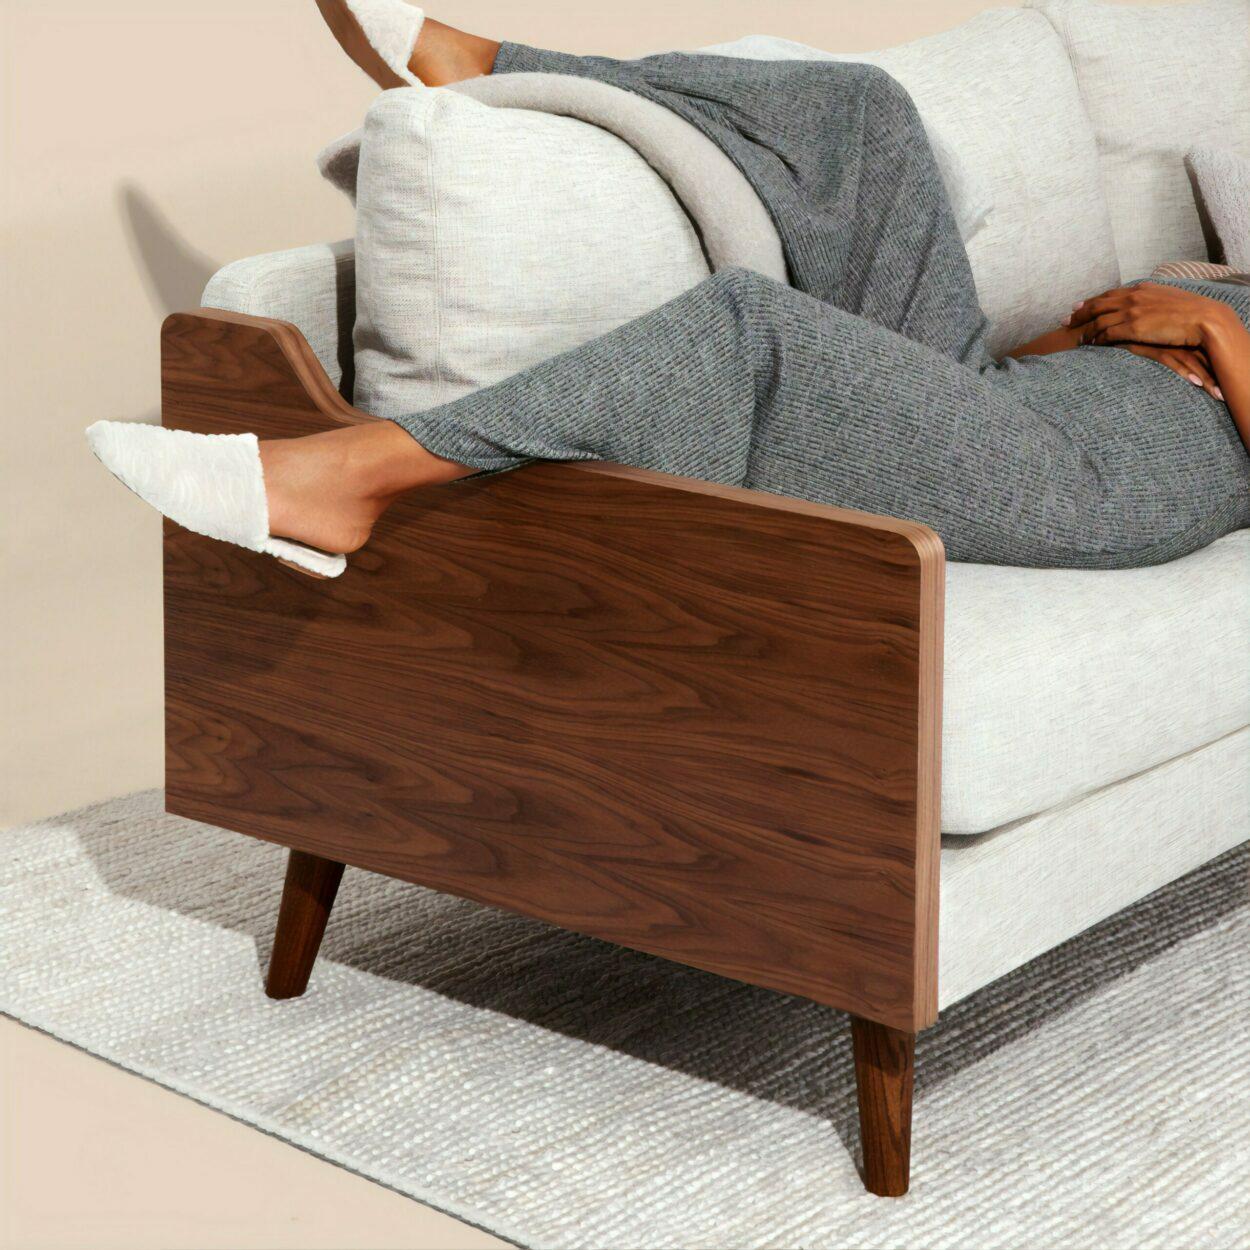 Couchpotato inside weather unsplash scaled e1627049325418